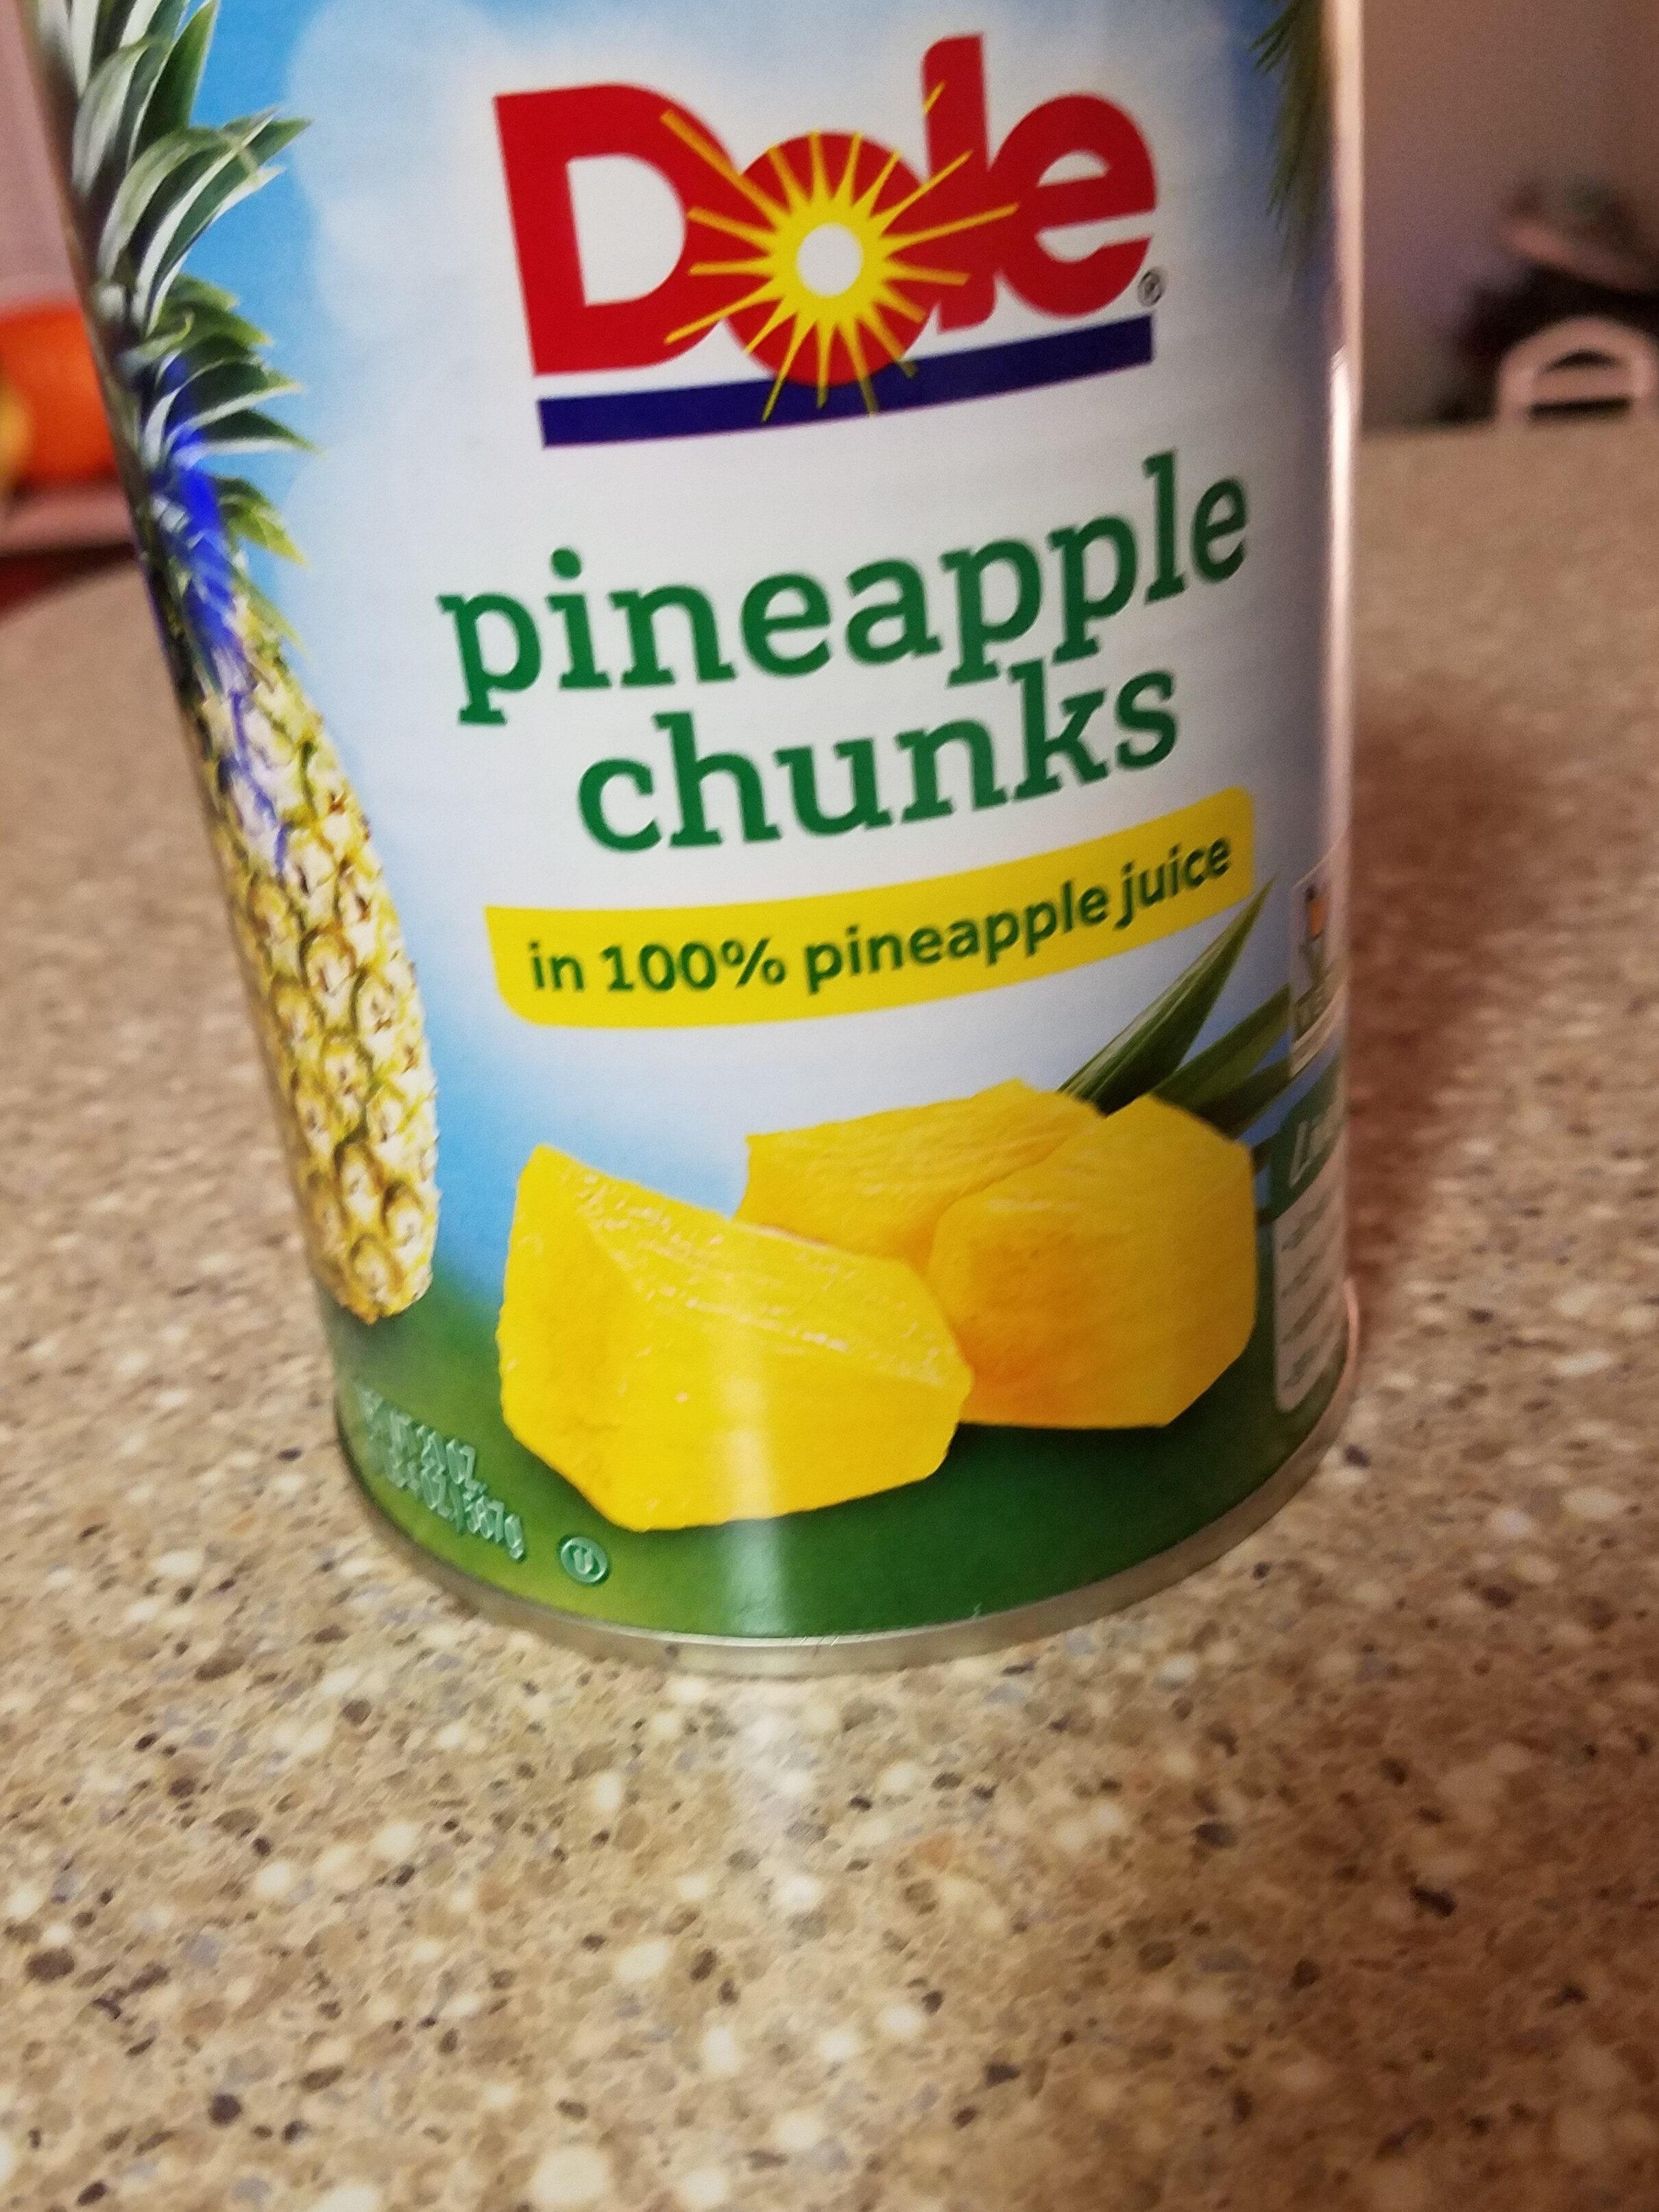 Pineapple chunks in 100% pineapple juice - Produkt - en